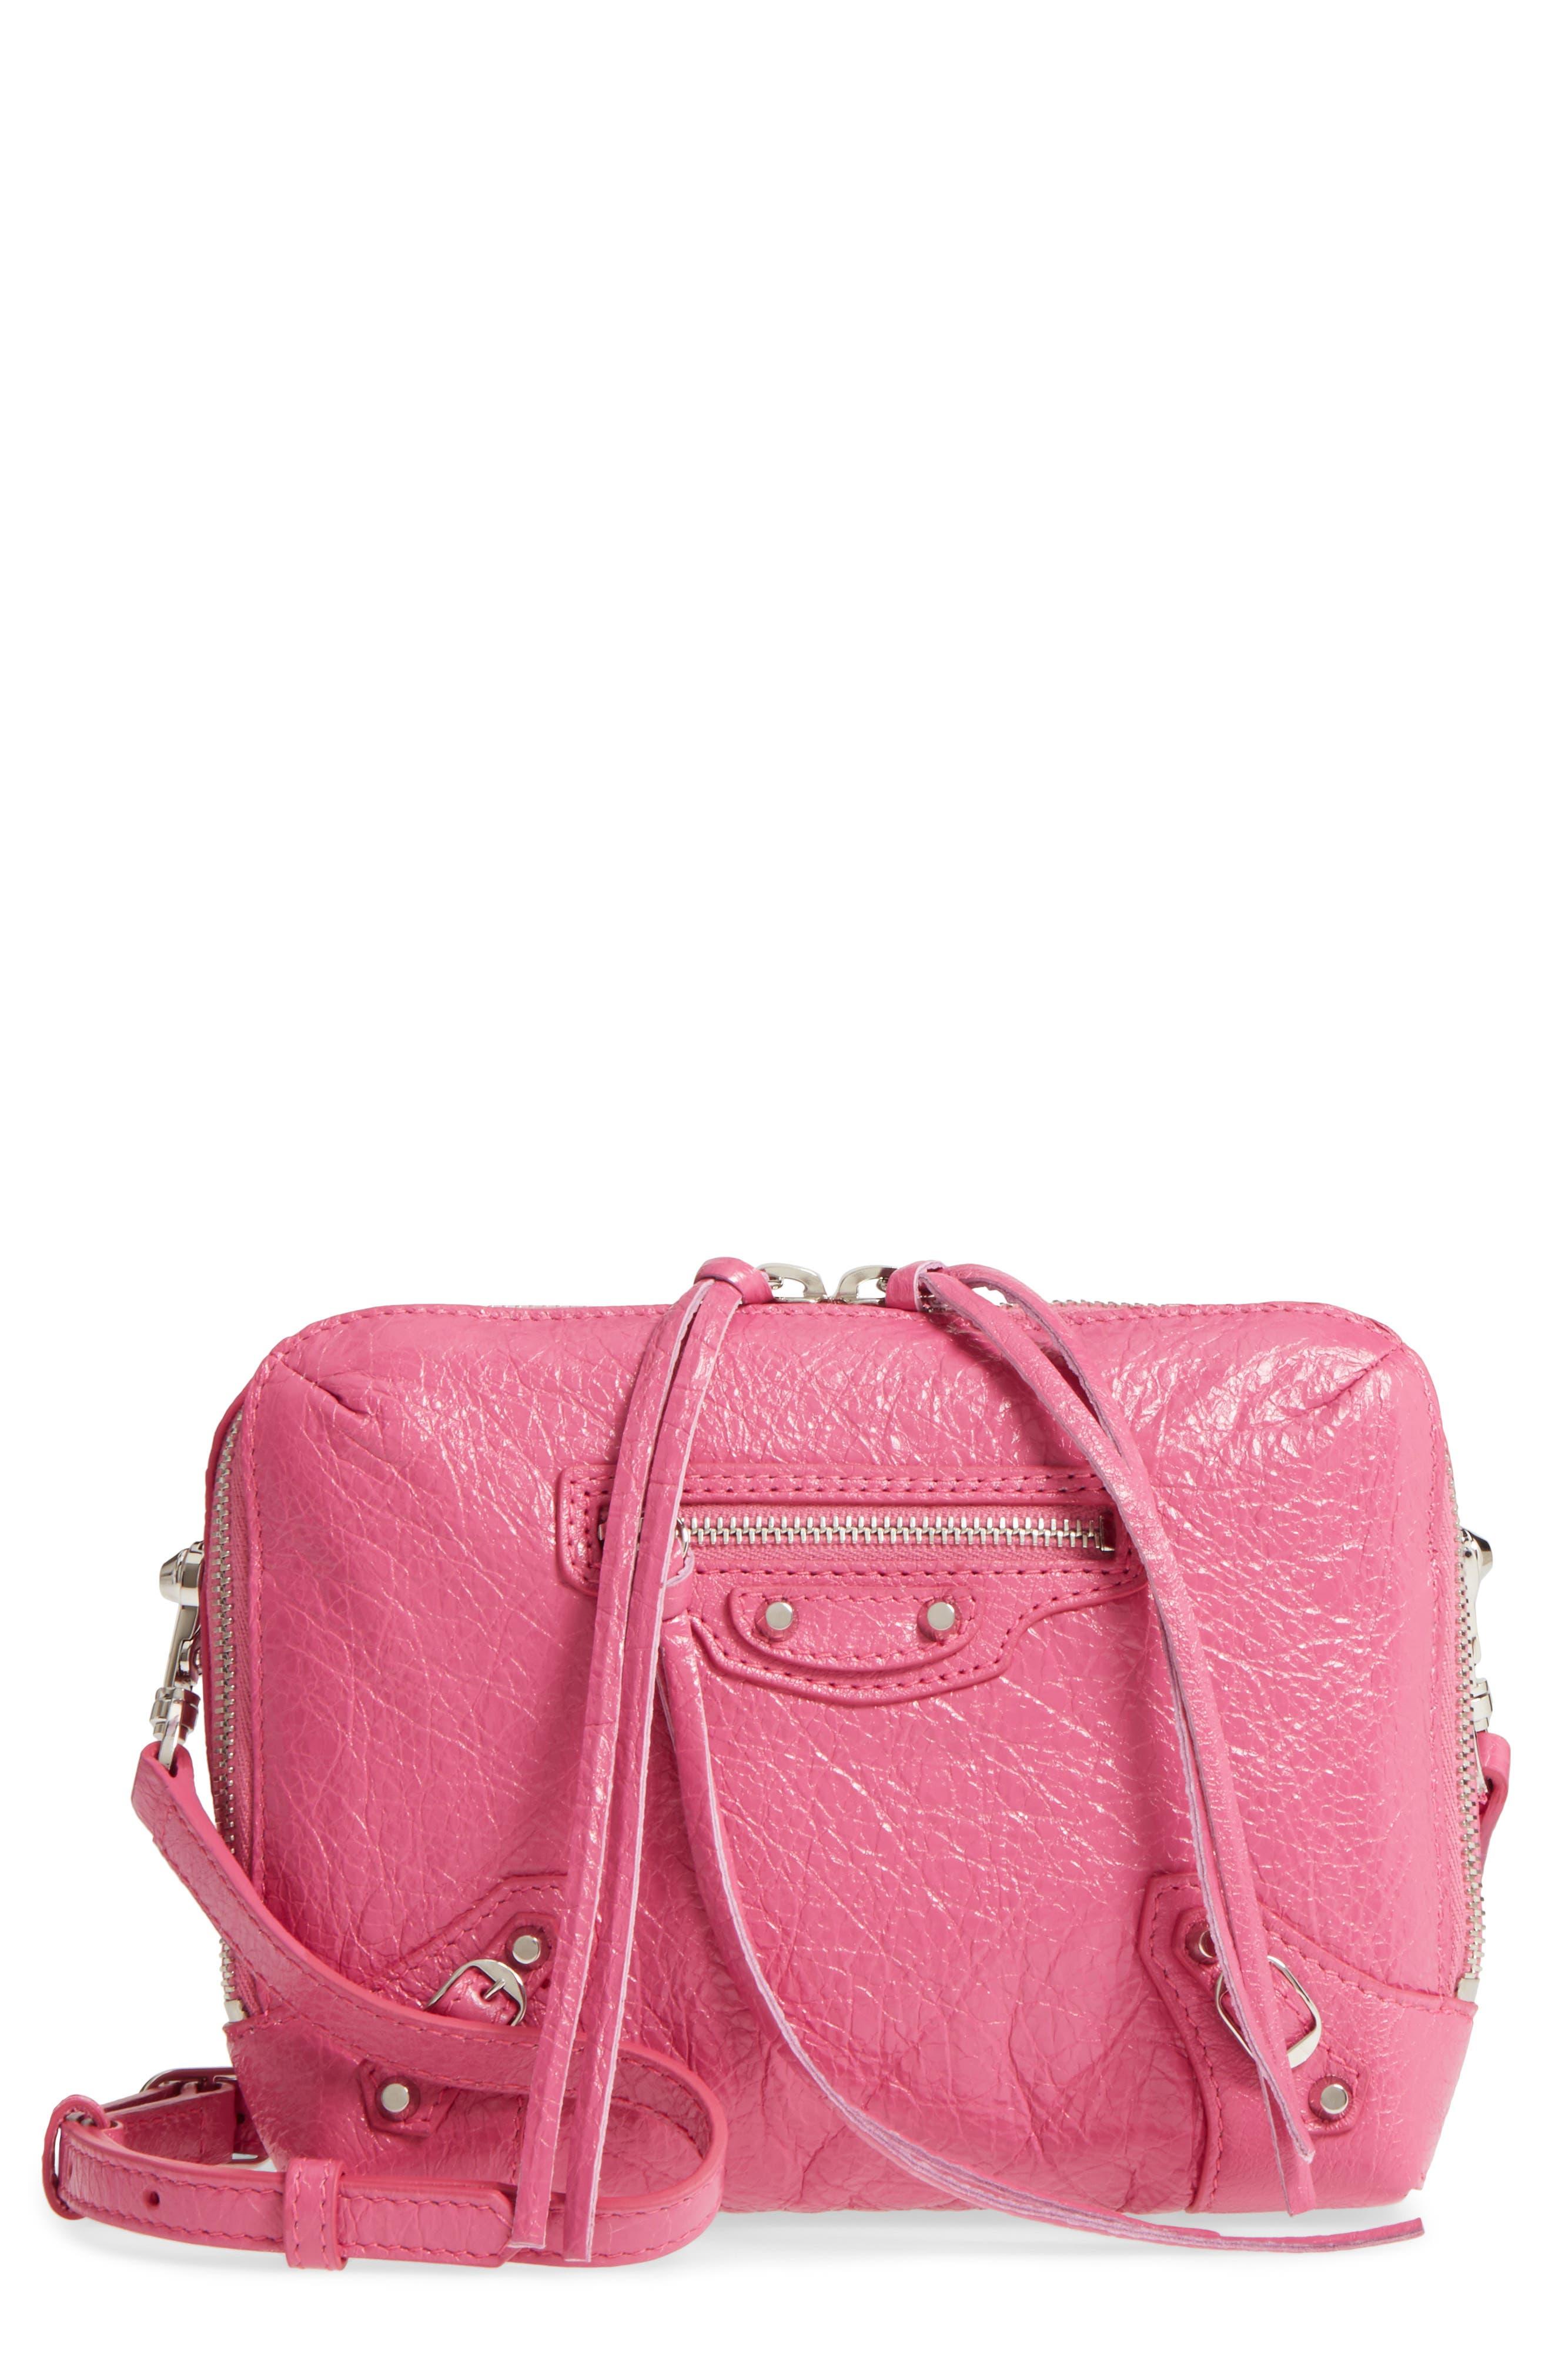 Balenciaga Extra Small Classic Reporter Leather Shoulder Bag